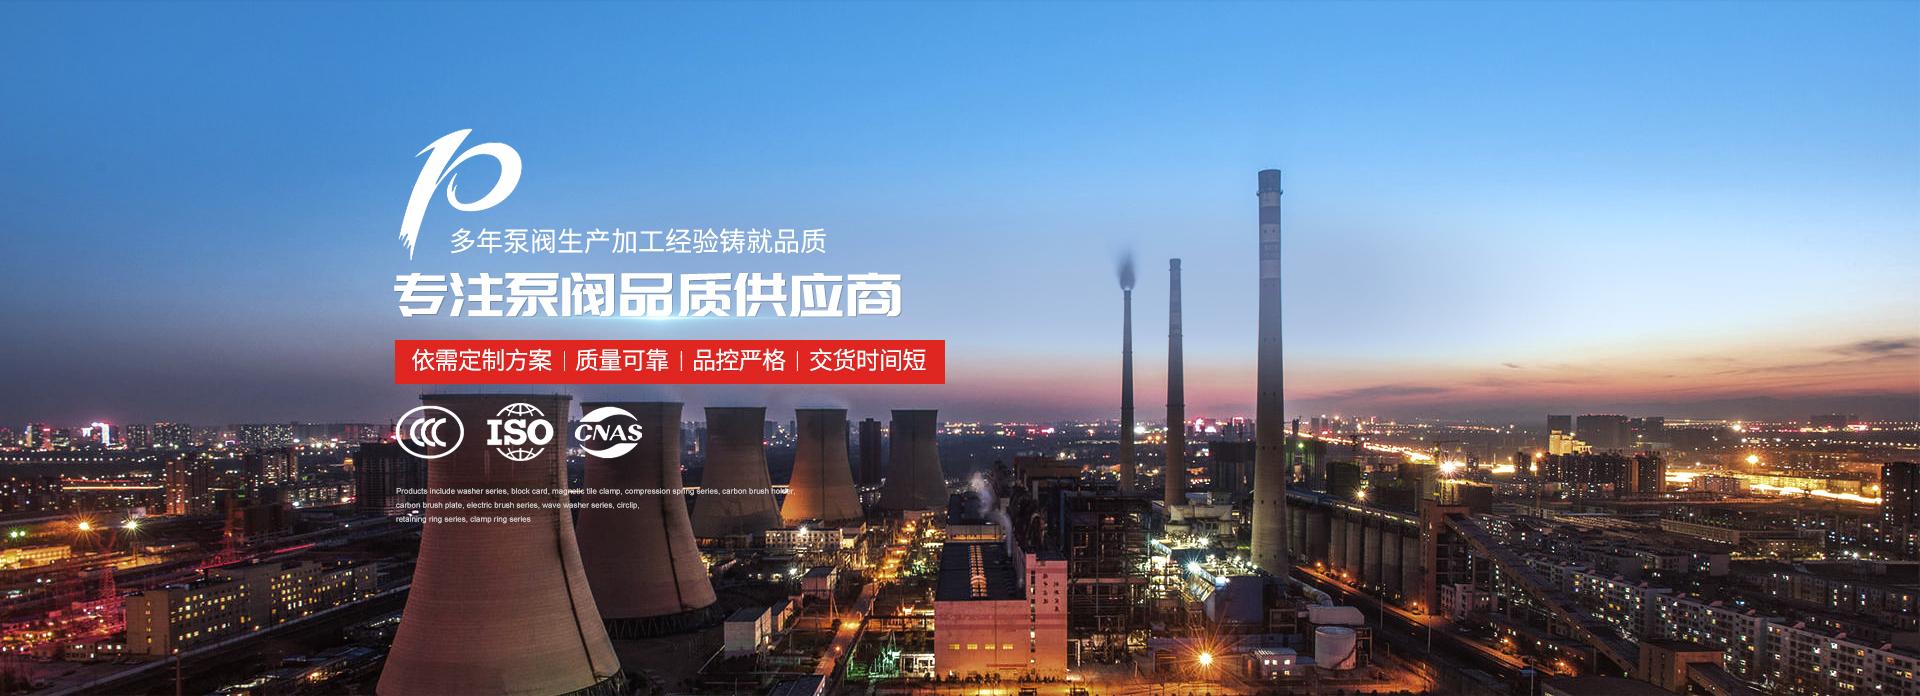 潛(qian)水排(pai)污泵廠(chang)家-上海(hai)高(gao)適(shi)泵閥(fa)有限公司